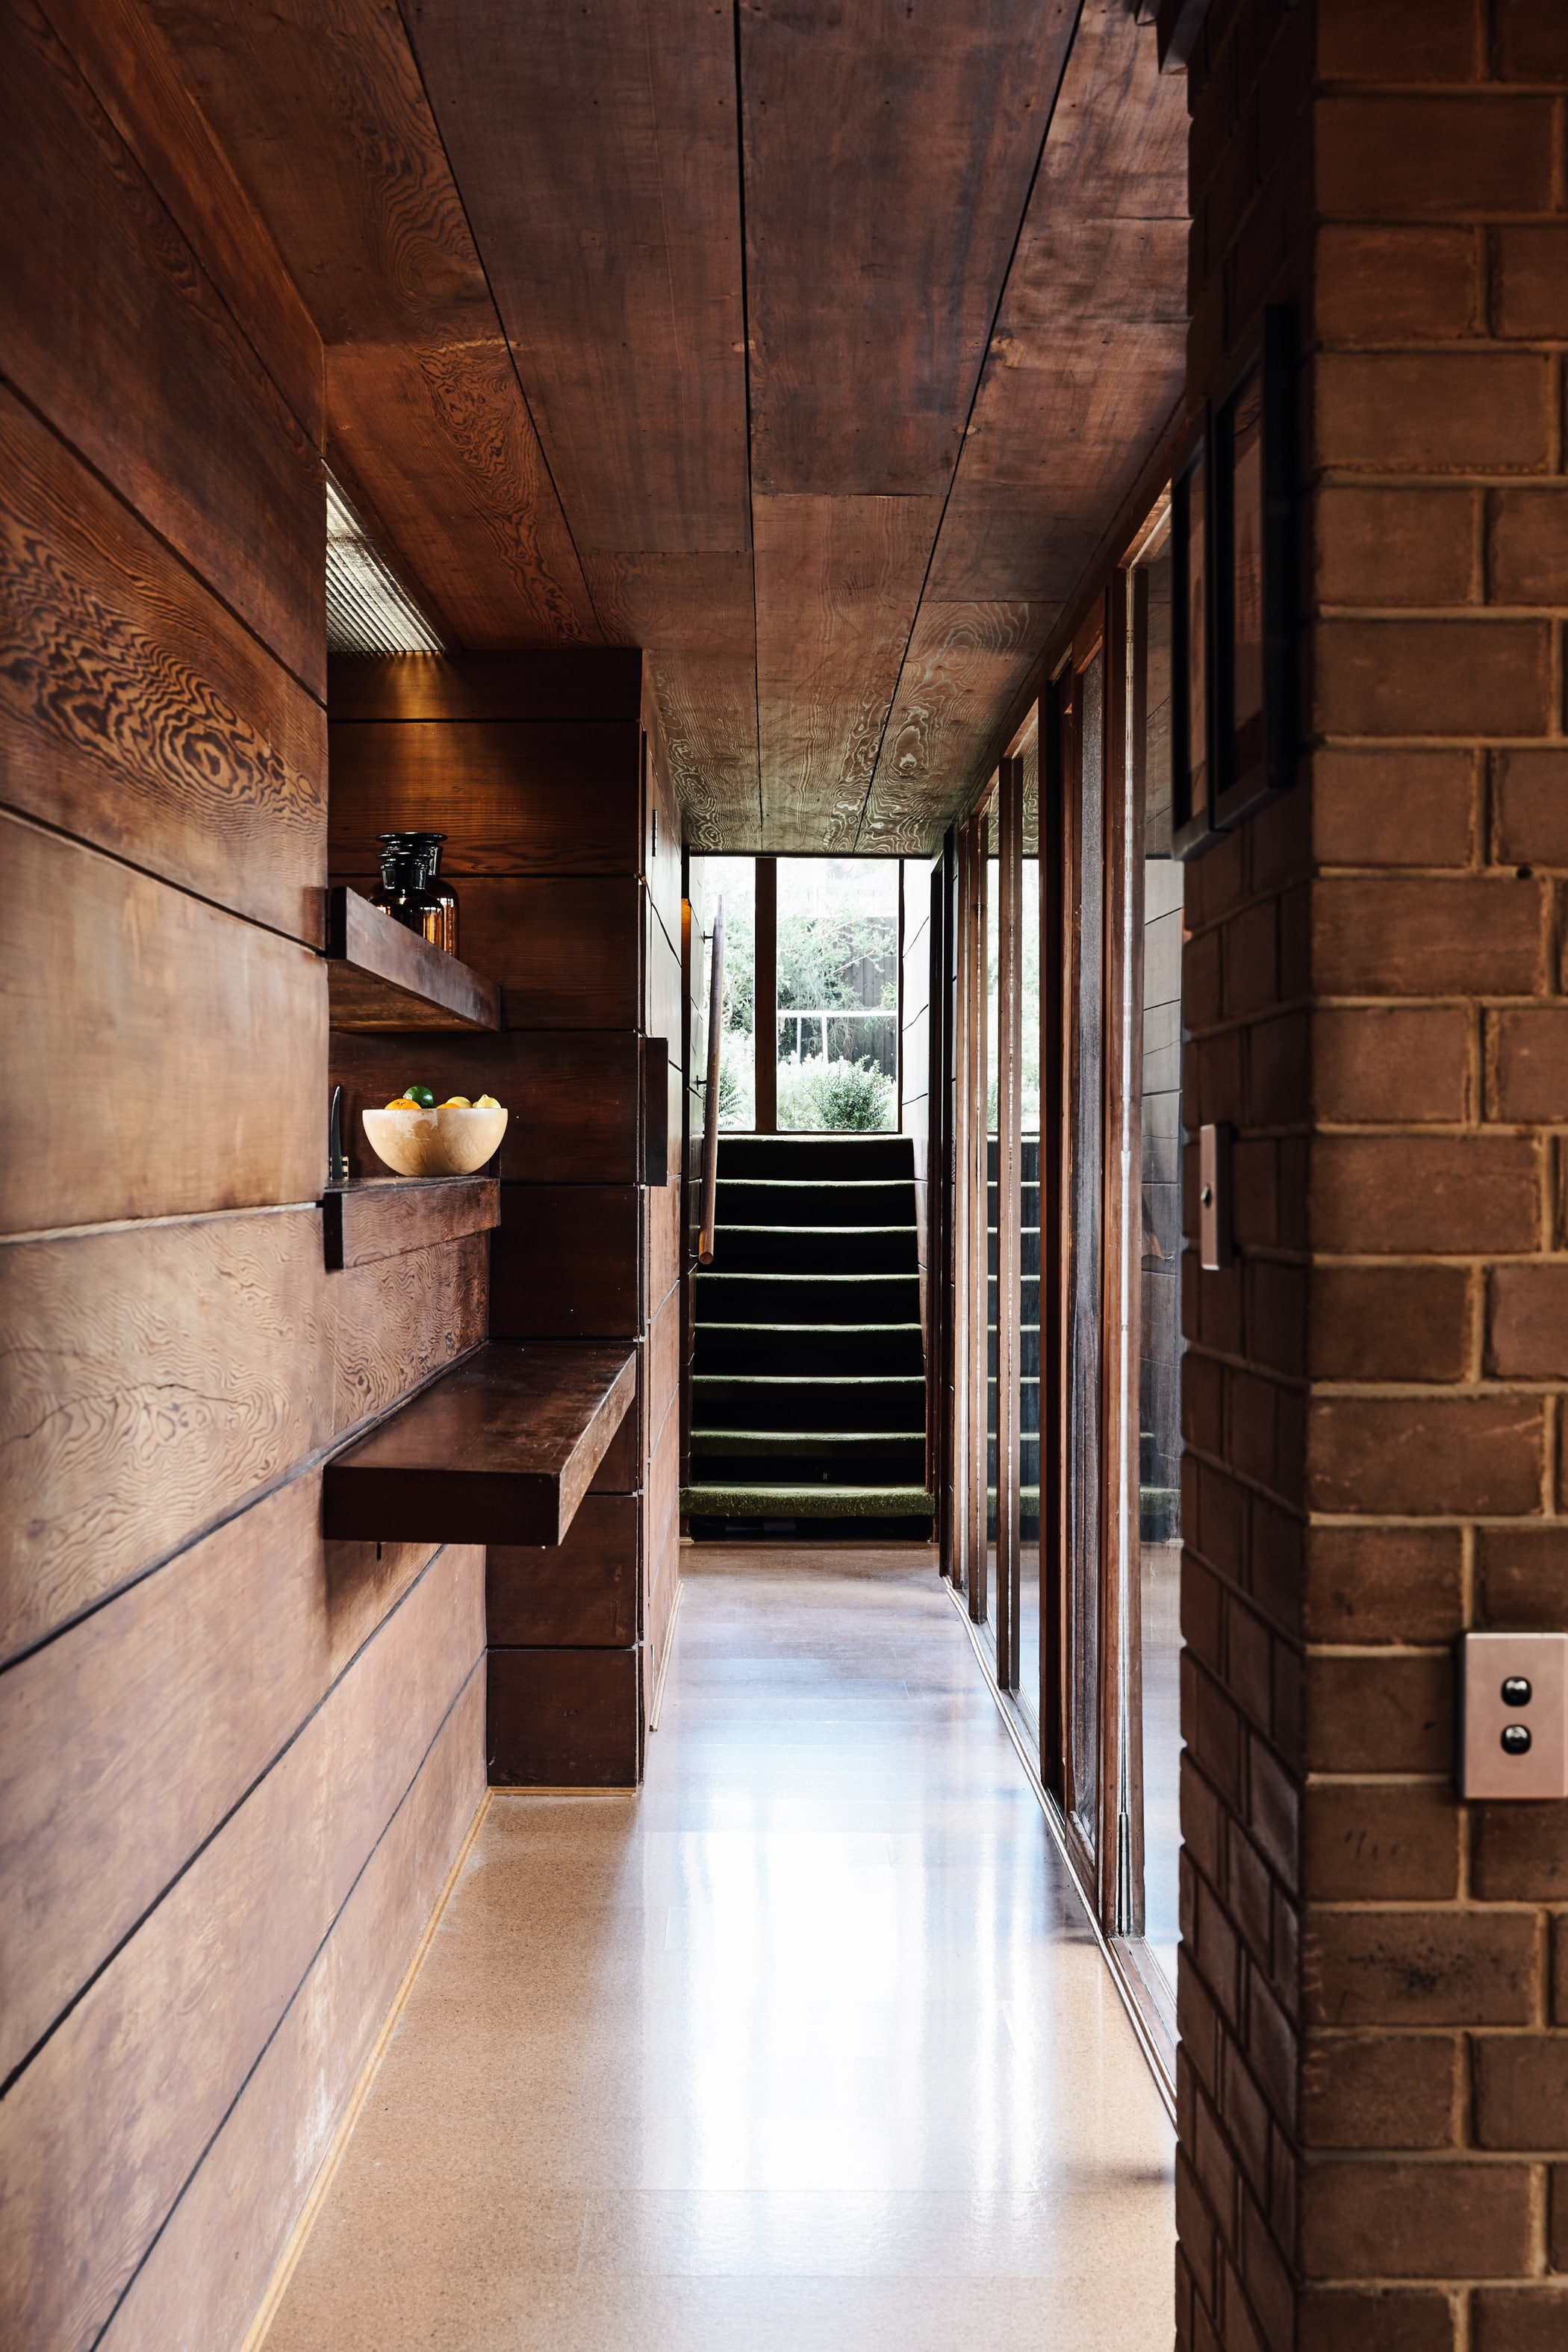 Gallery Of The Godsell House By David Godsell Local Australian Bespoke Architecture & Interiors Beaumaris, Vic Image 4